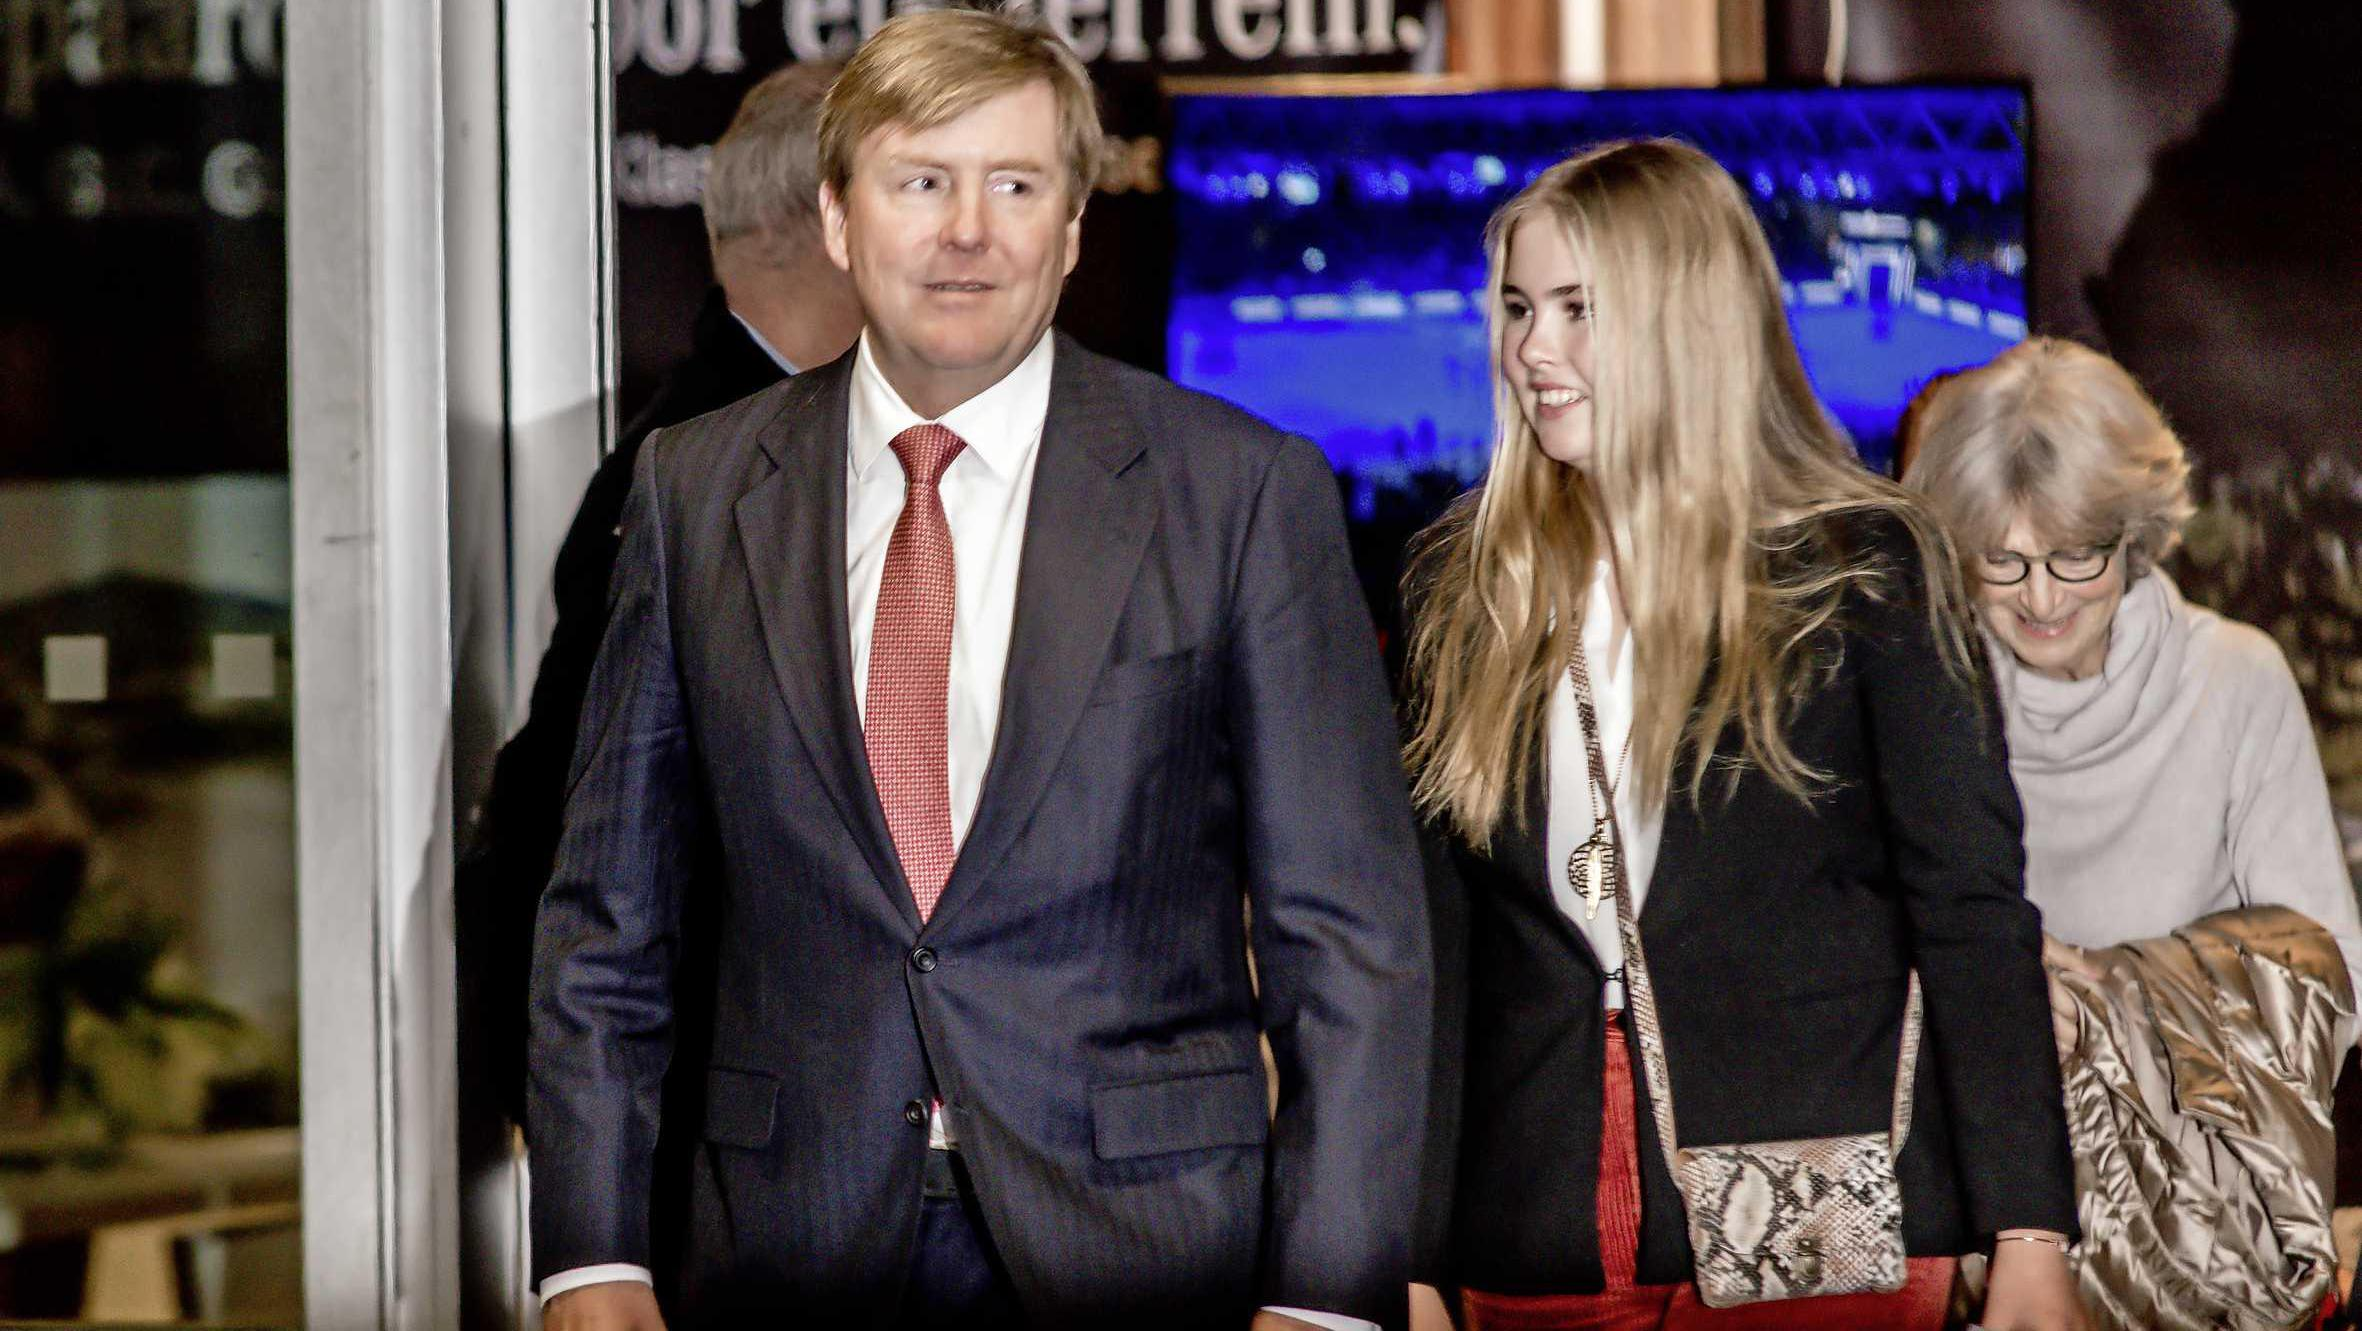 Artikelen Over Prinses Amalia Telegraafnl